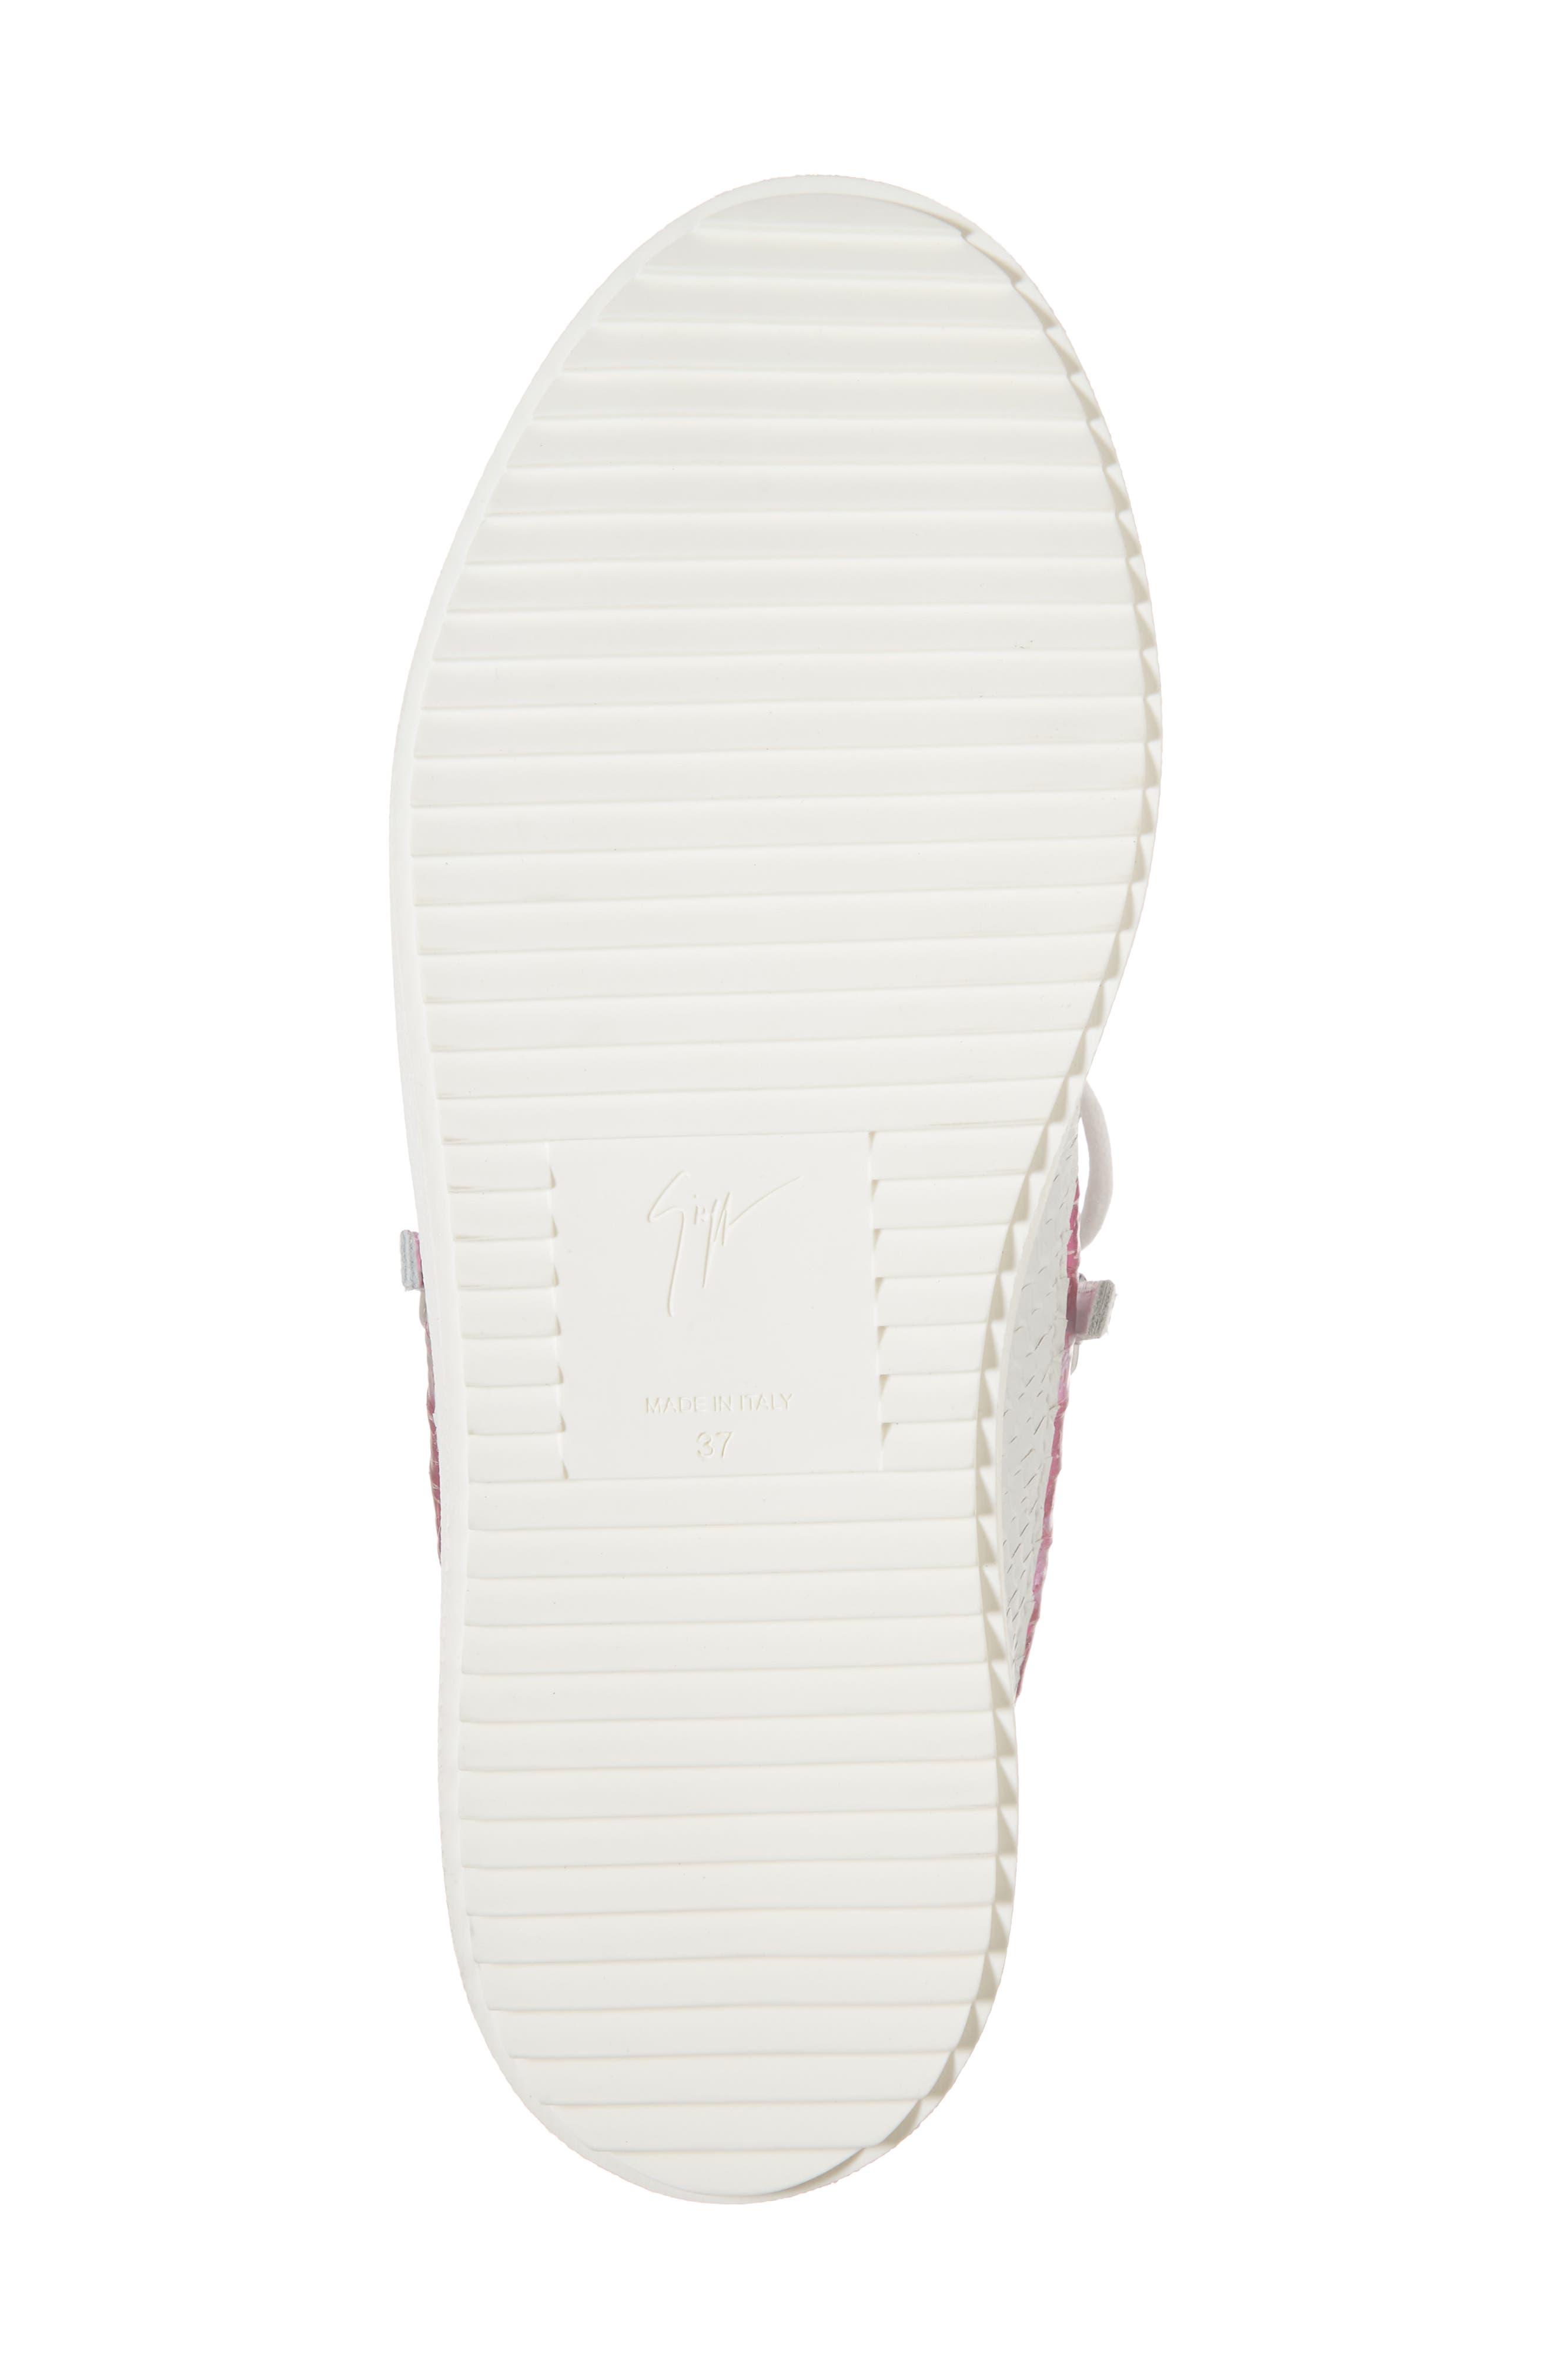 Low Top Sneaker,                             Alternate thumbnail 6, color,                             White/ Fuchsia